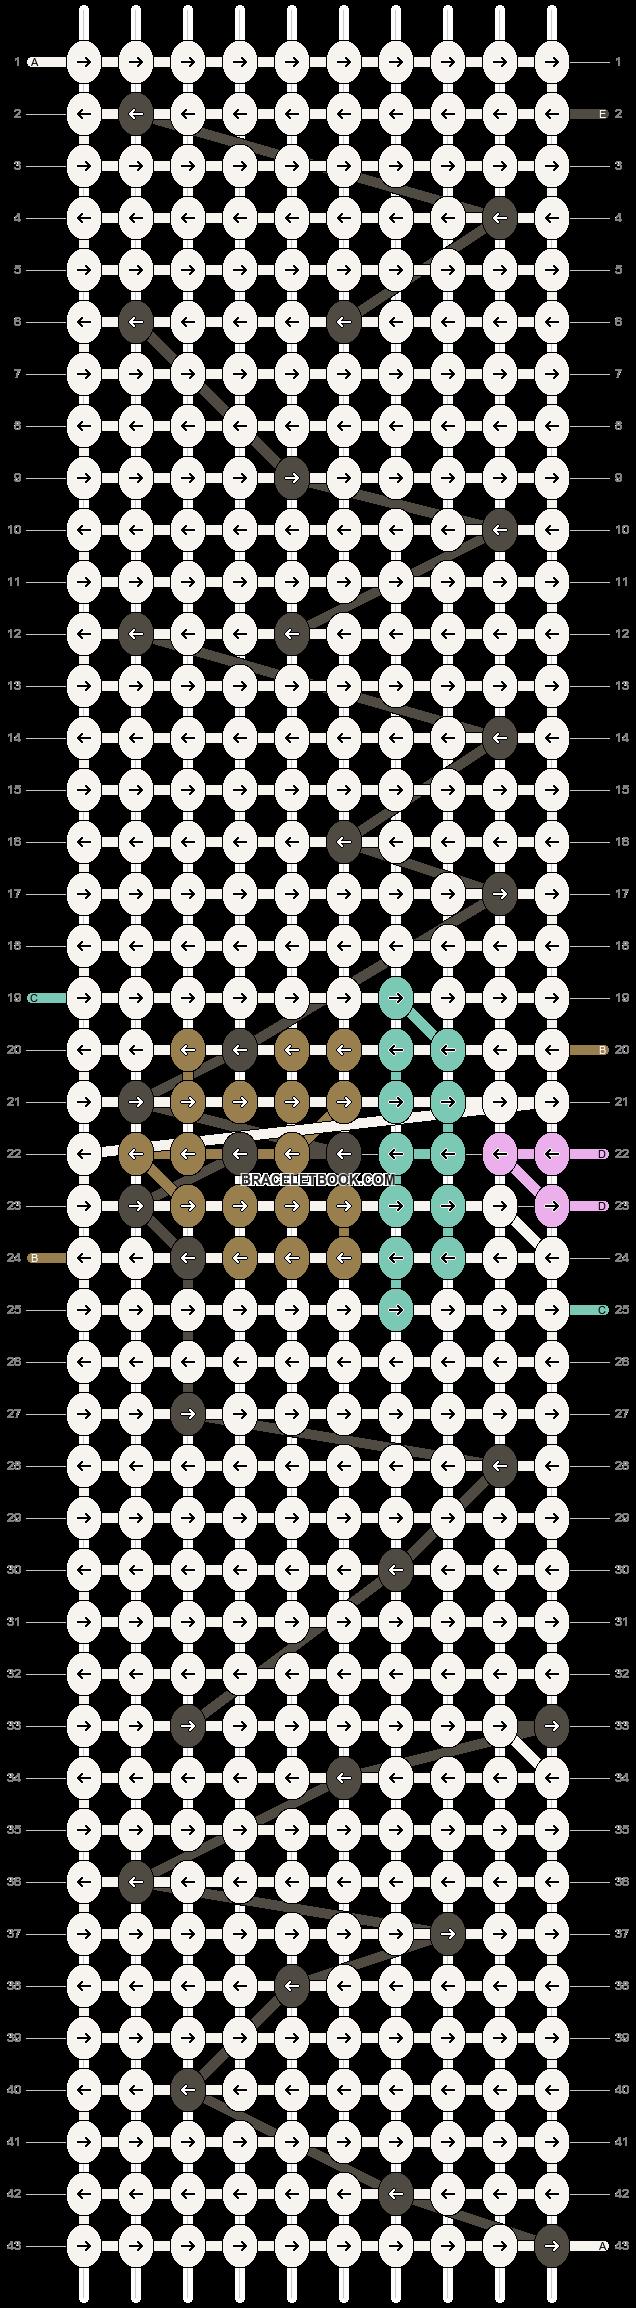 Alpha pattern #51637 pattern